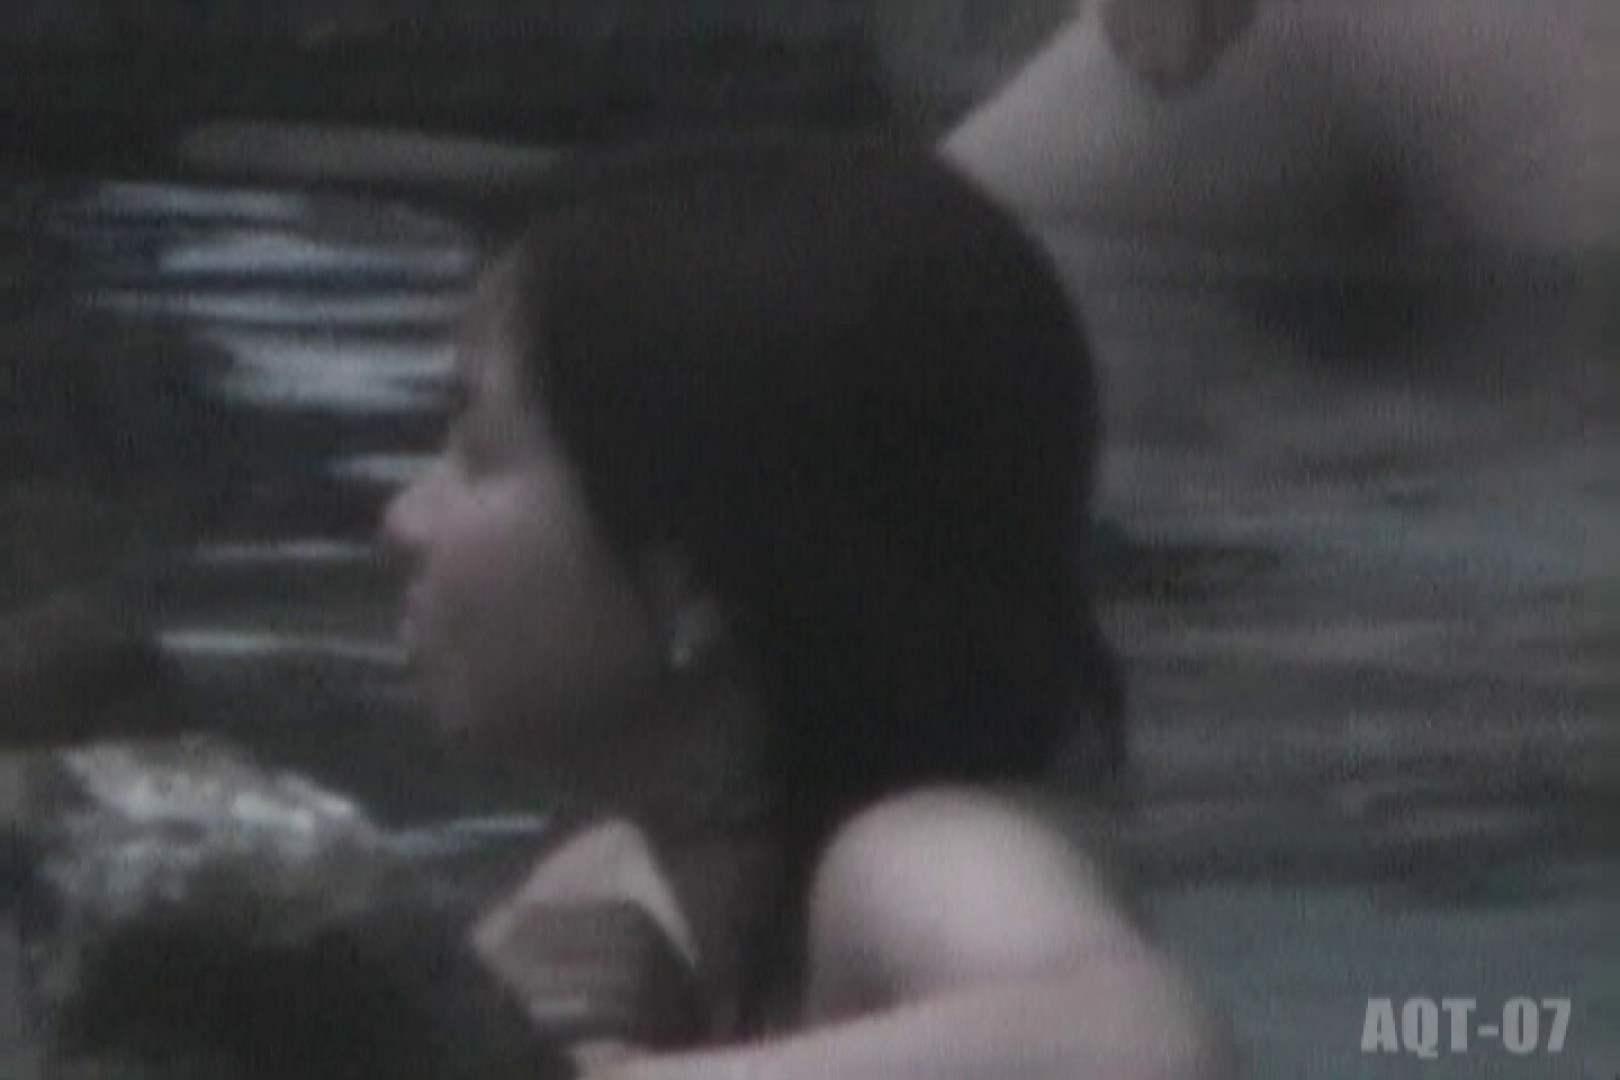 Aquaな露天風呂Vol.770 OLのプライベート  11pic 3